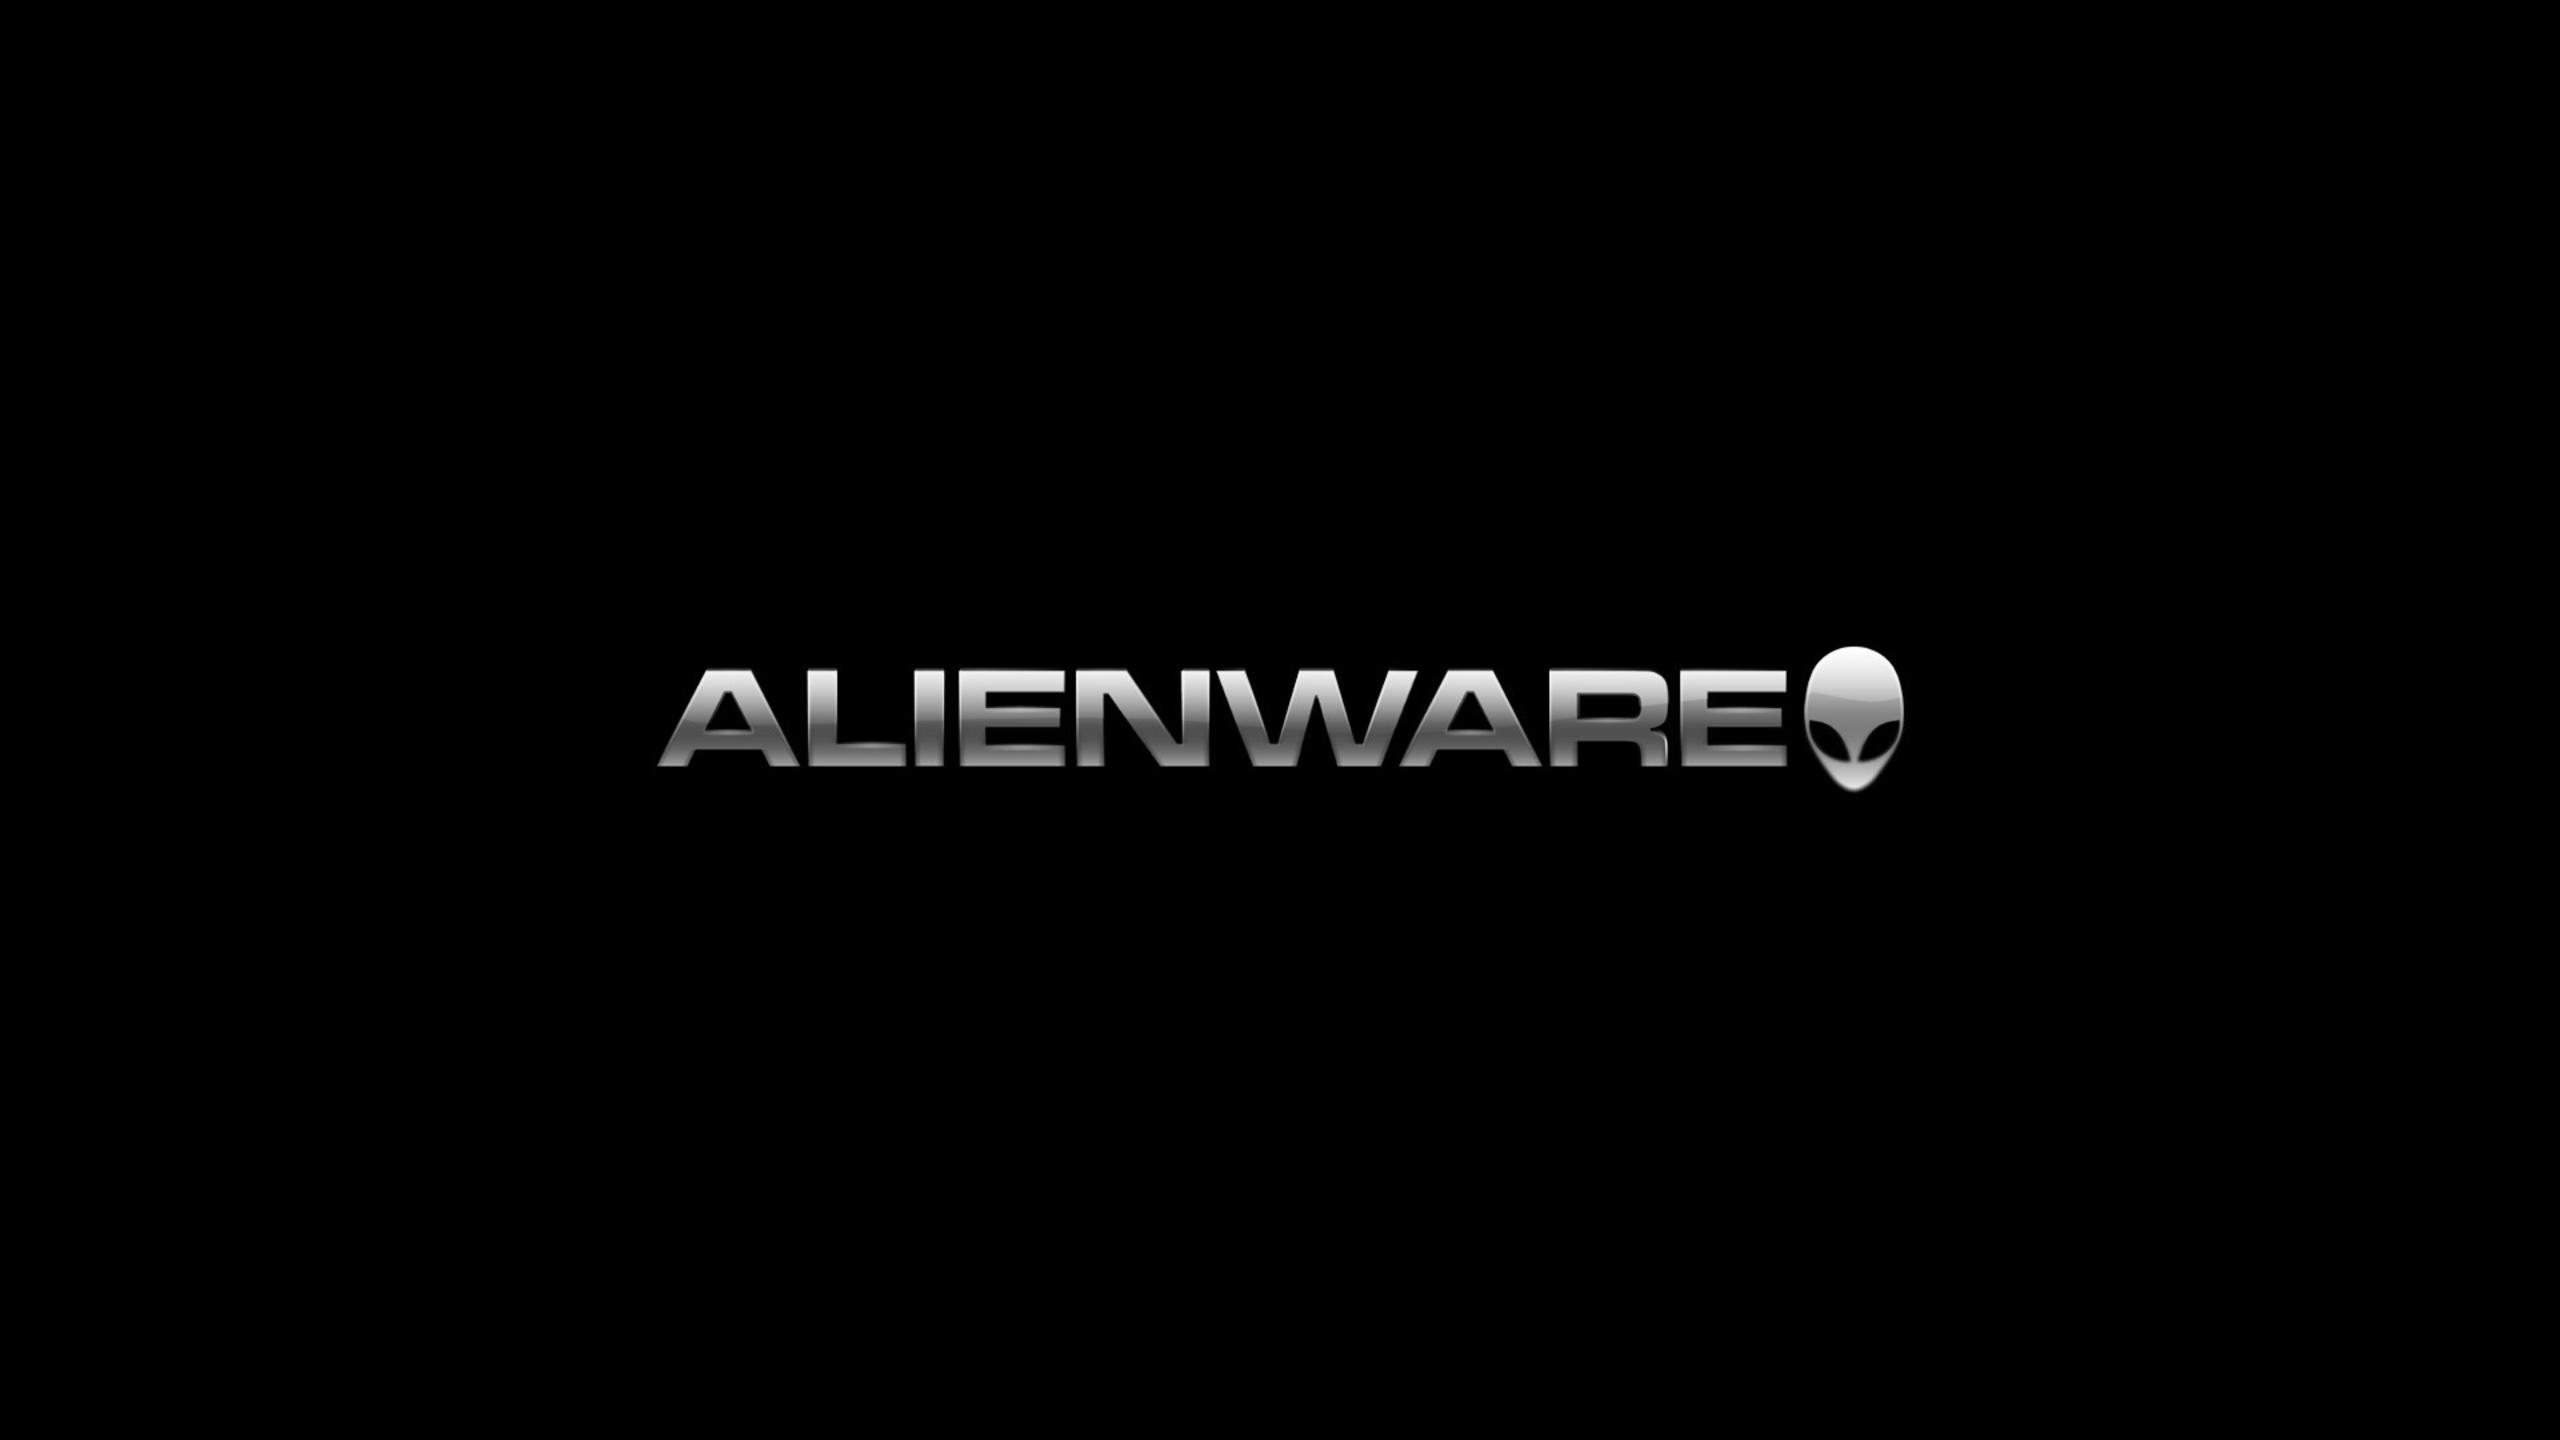 2560x1440 Alienware Logo 1440P Resolution HD 4k Wallpapers